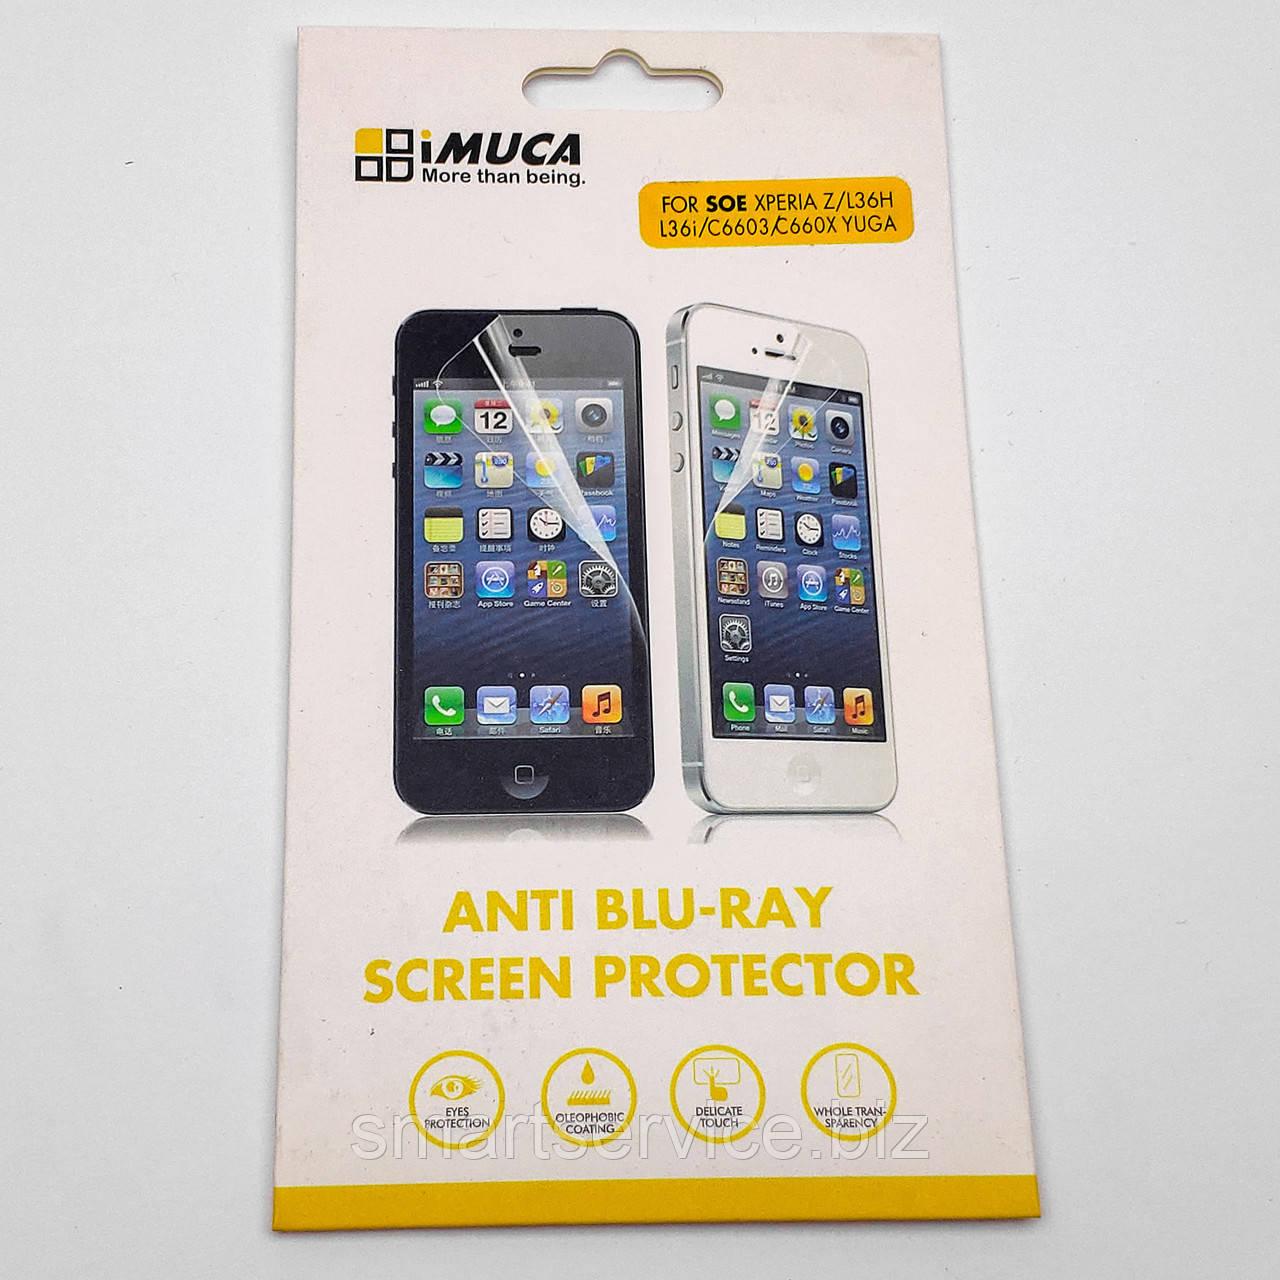 Защитная пленка IMUCA с Anti Blu-ray покрытием для Sony Xperia Z